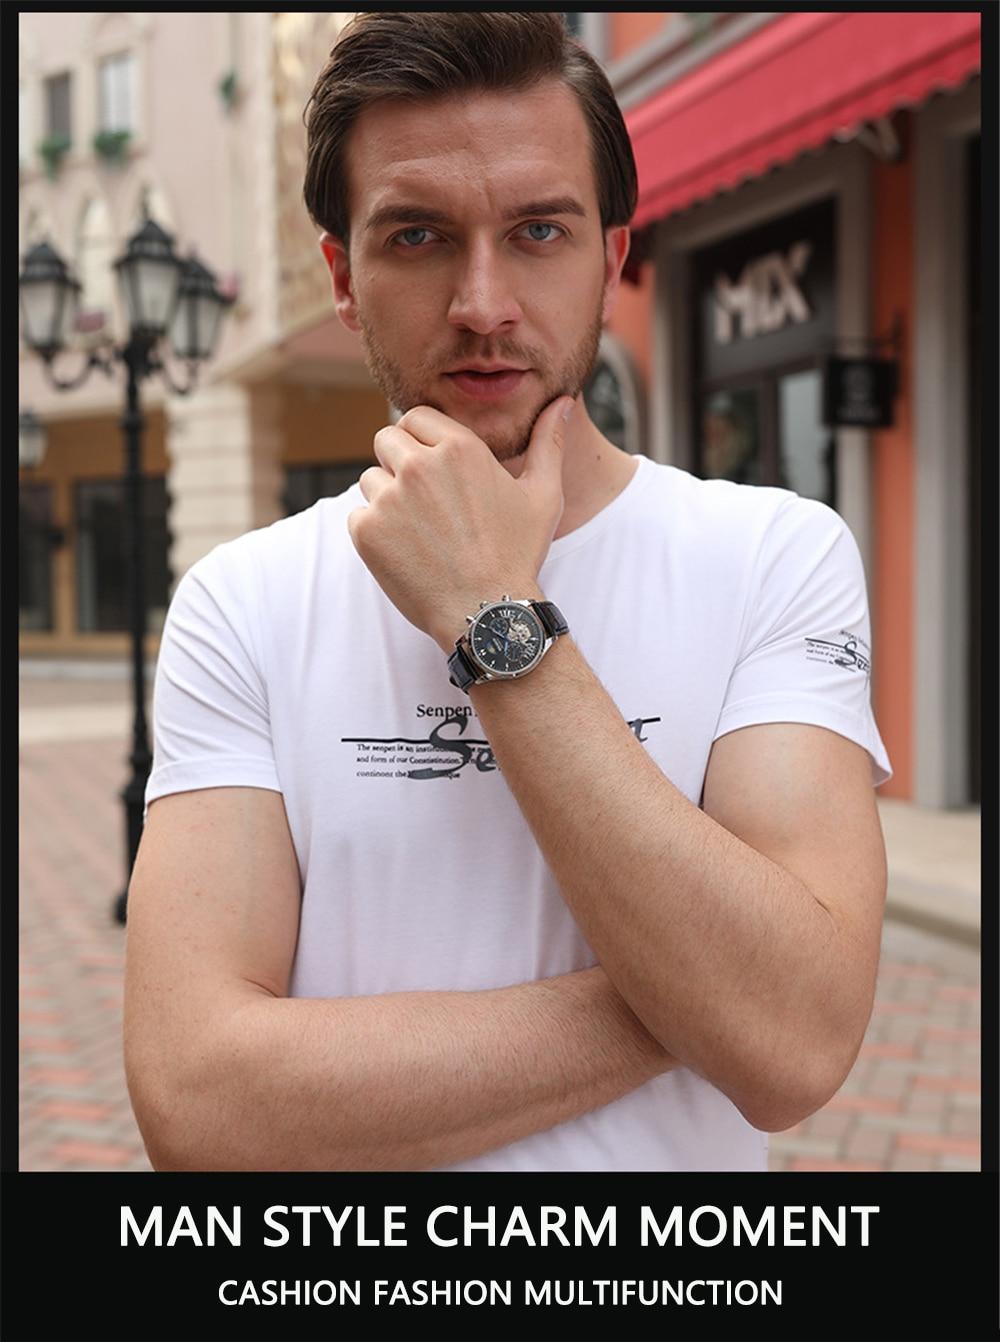 HTB1NECGXJzvK1RkSnfoq6zMwVXaF HAIQIN men's/mens watches top brand luxury automatic/mechanical/luxury watch men sport wristwatch mens reloj hombre tourbillon